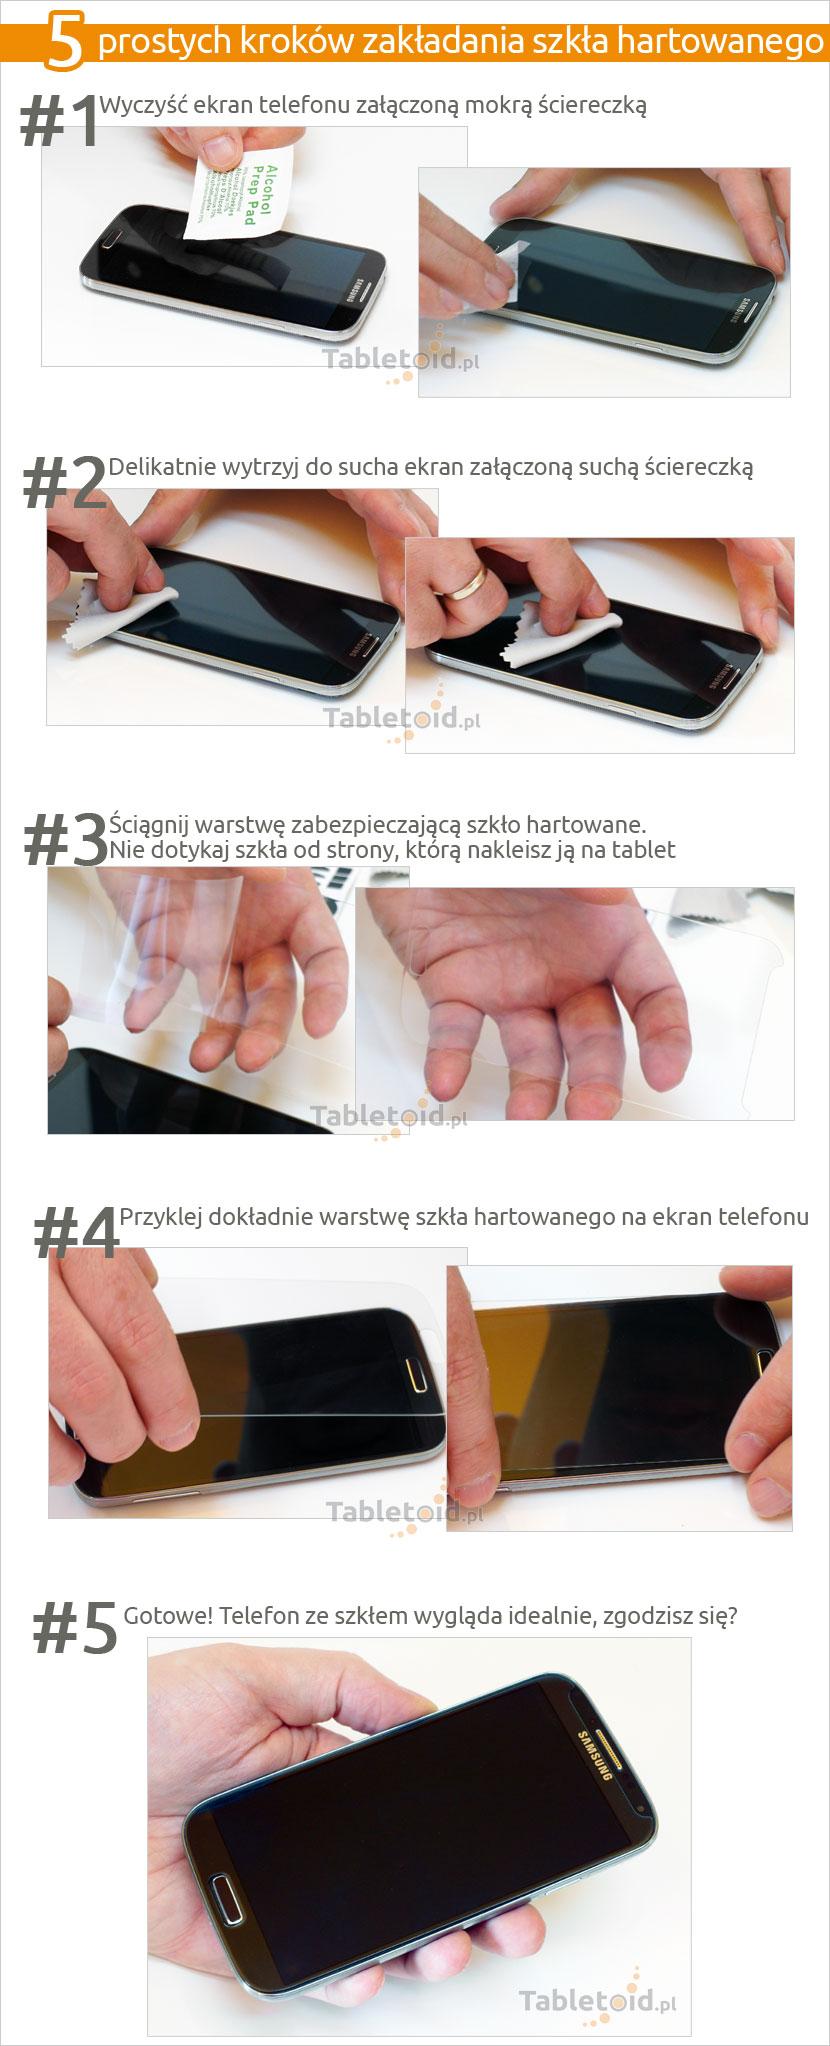 szkło dedykowane na smartfon Huawei Mate Pro 9